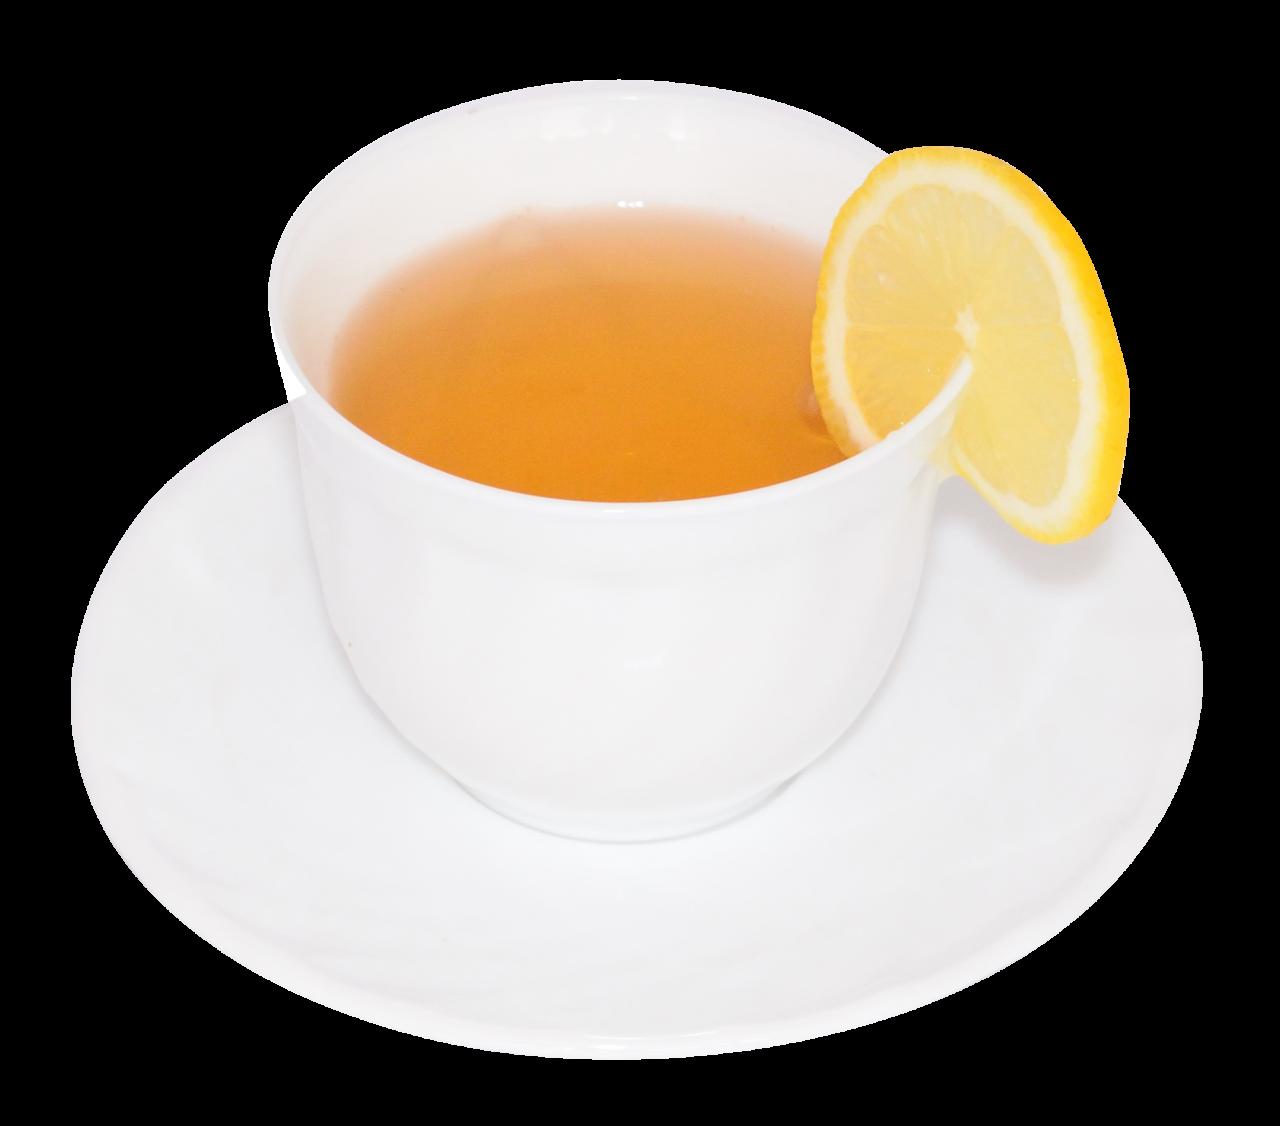 Cup of Lemon Green Tea PNG Image